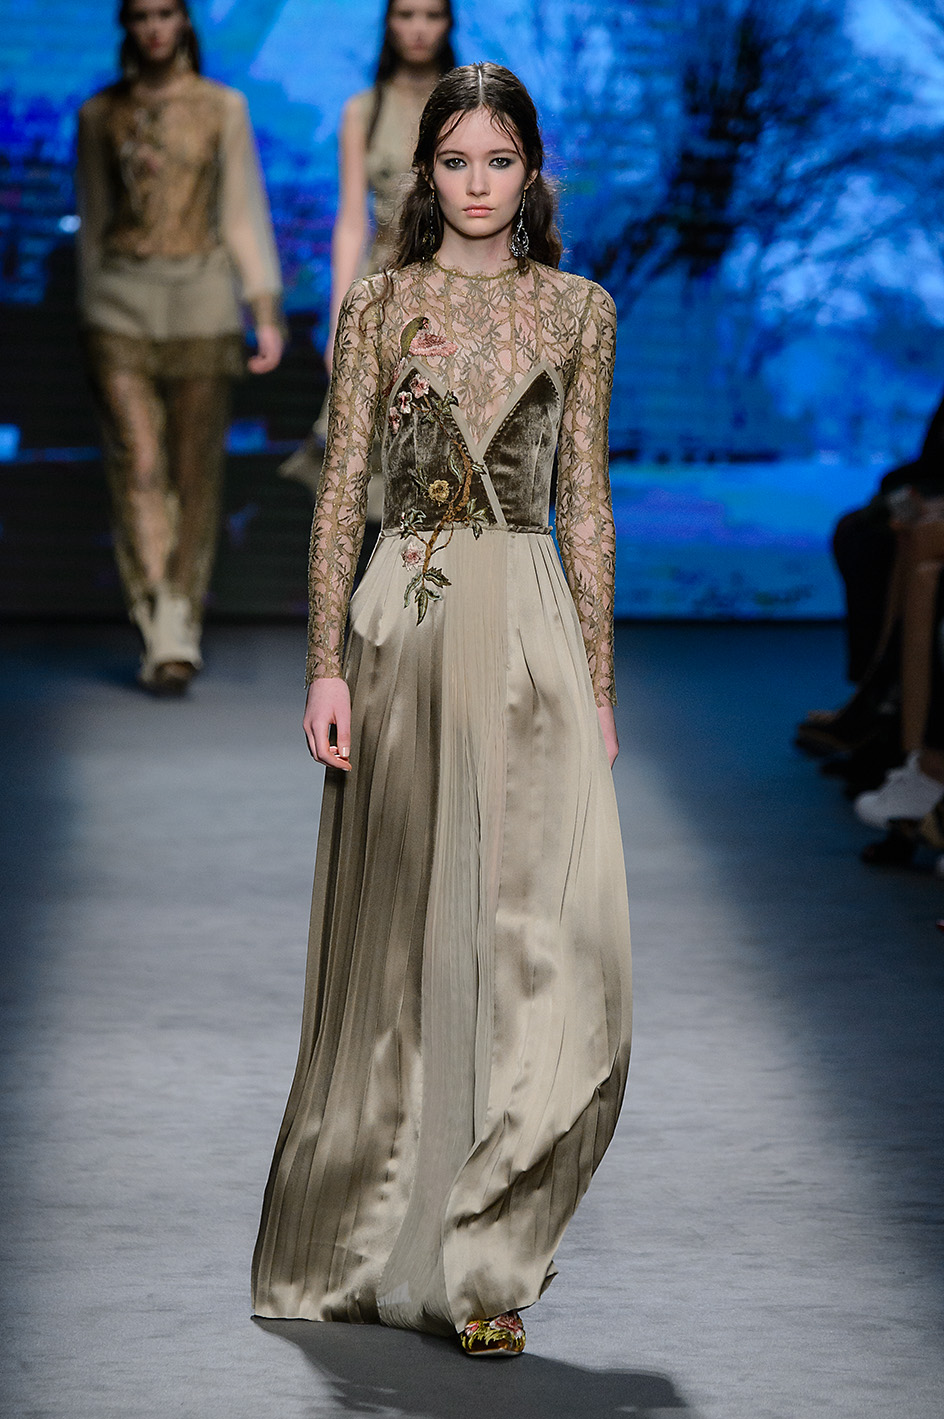 Milano Fashion week Autumn Winter 2016-17 Alberta Ferretti show